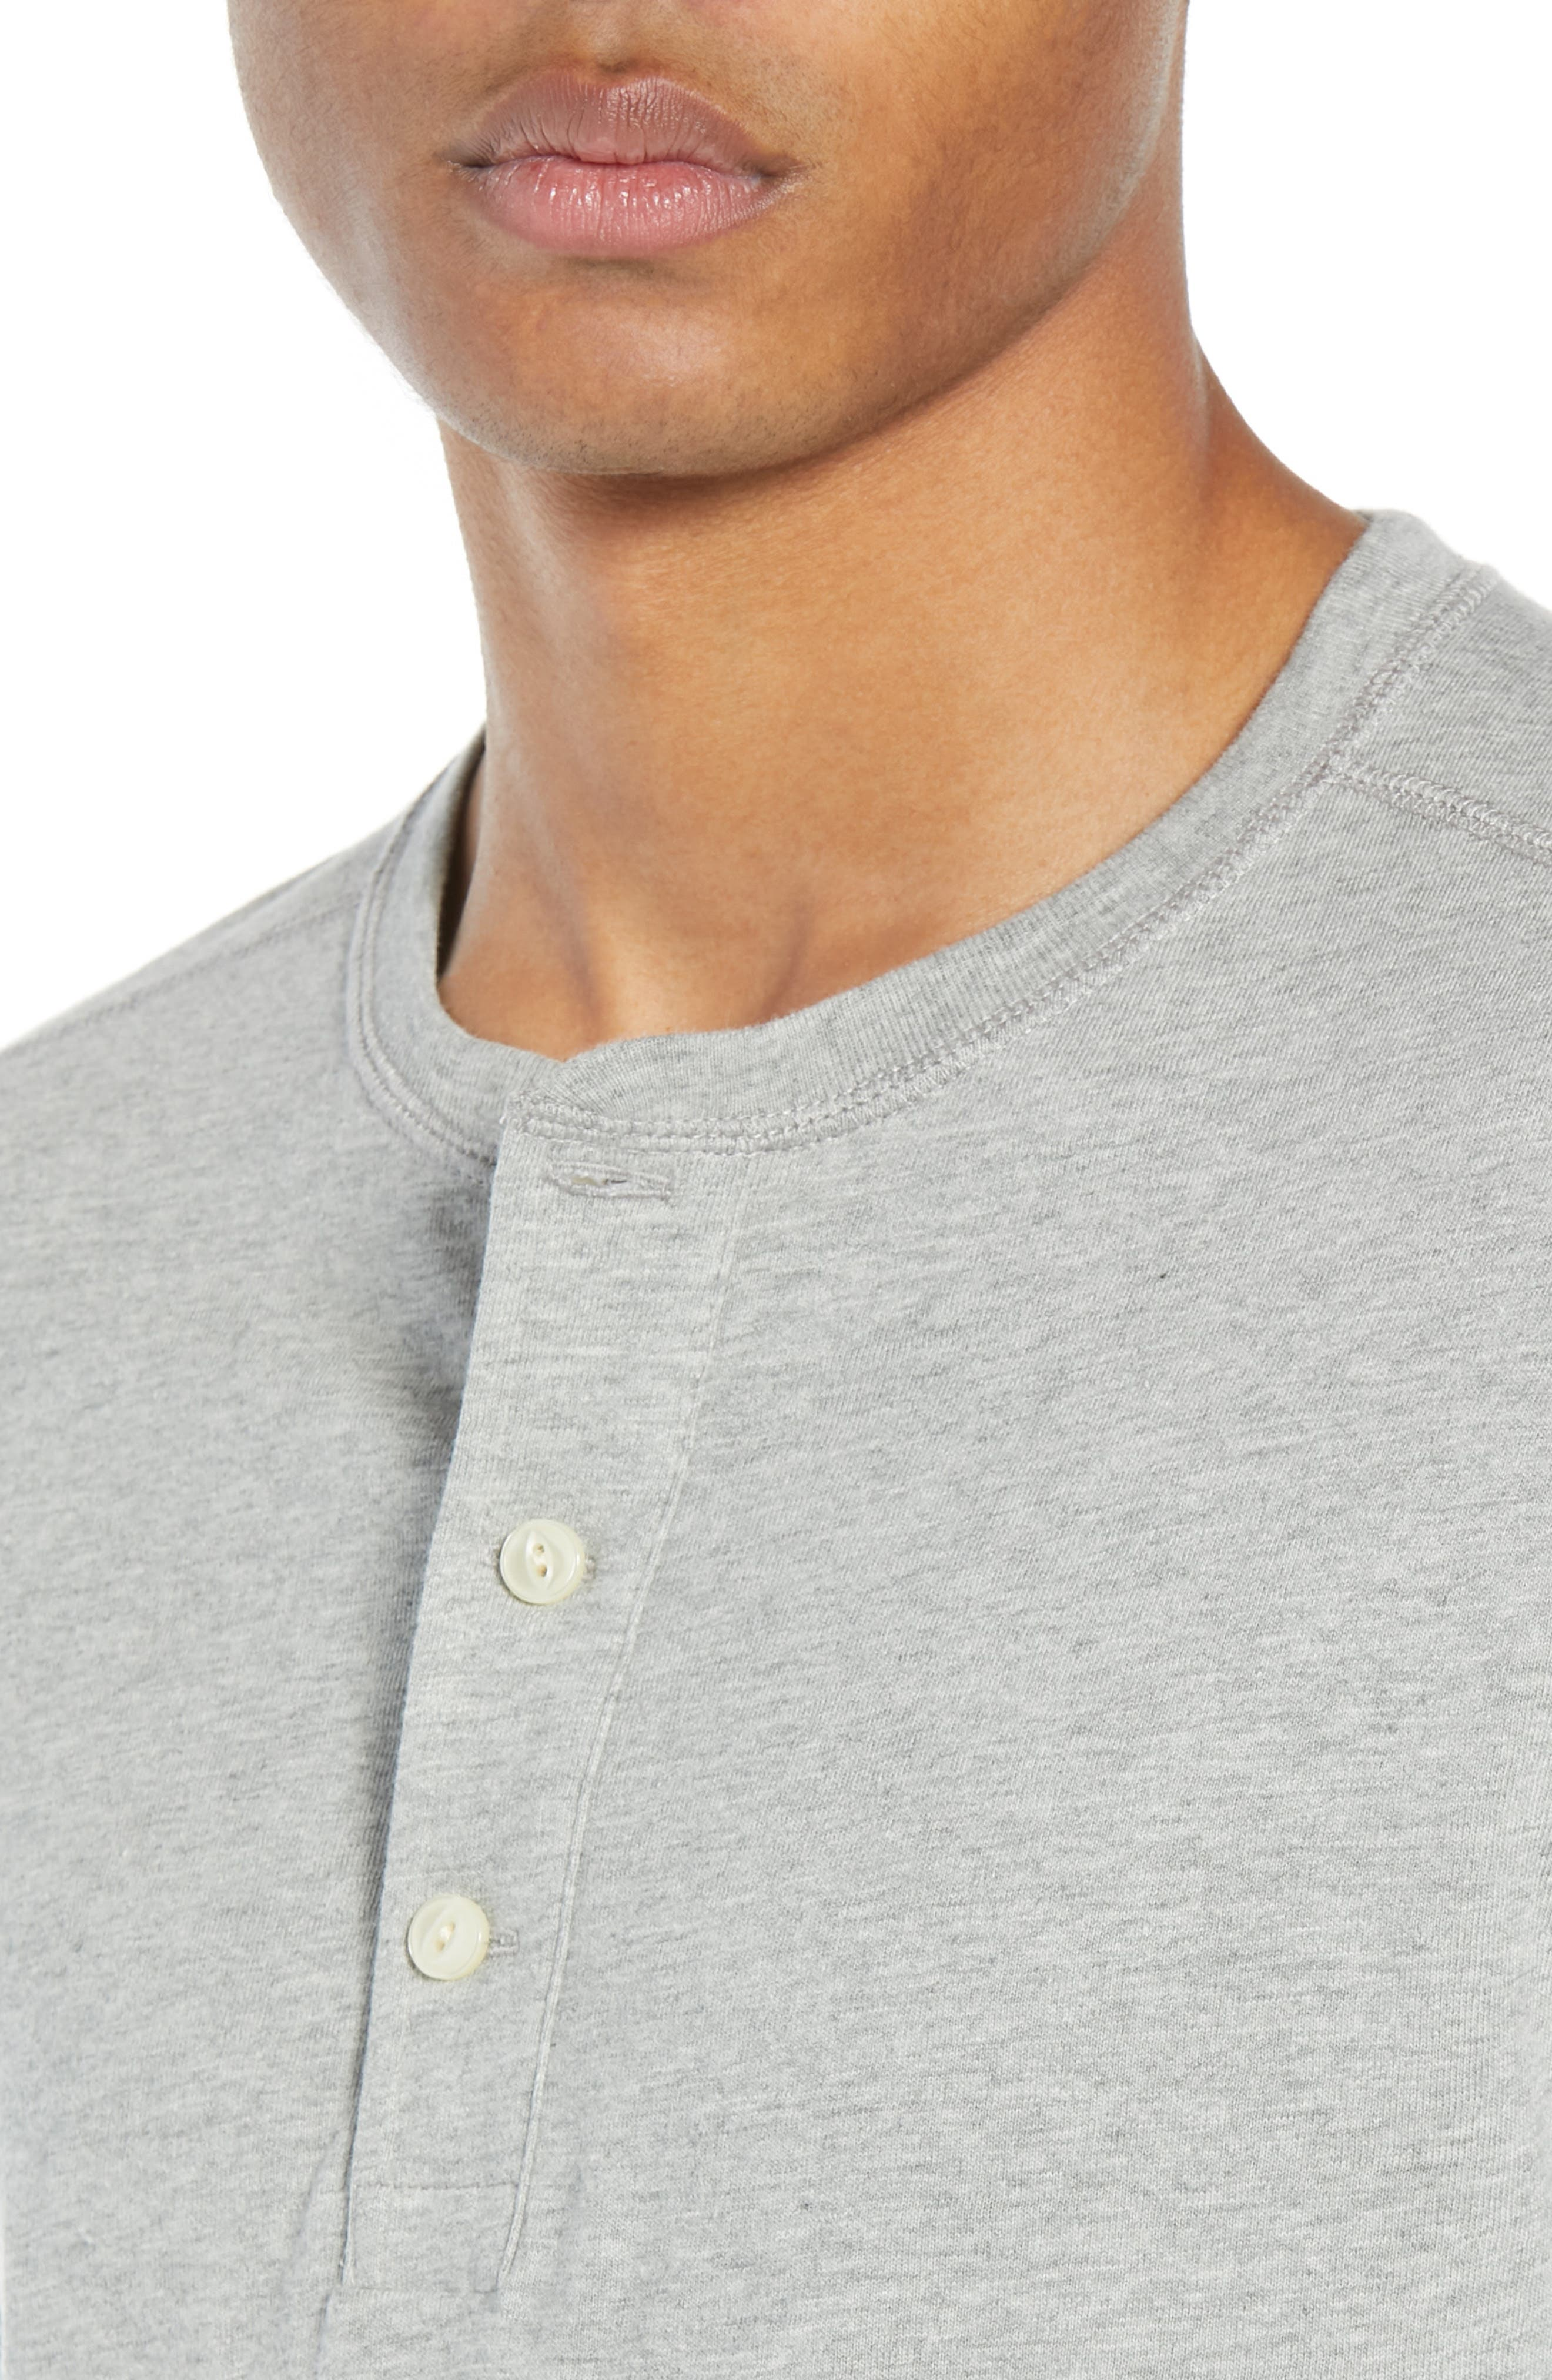 Slim Fit Garment Dyed Slub Cotton Henley,                             Alternate thumbnail 4, color,                             020